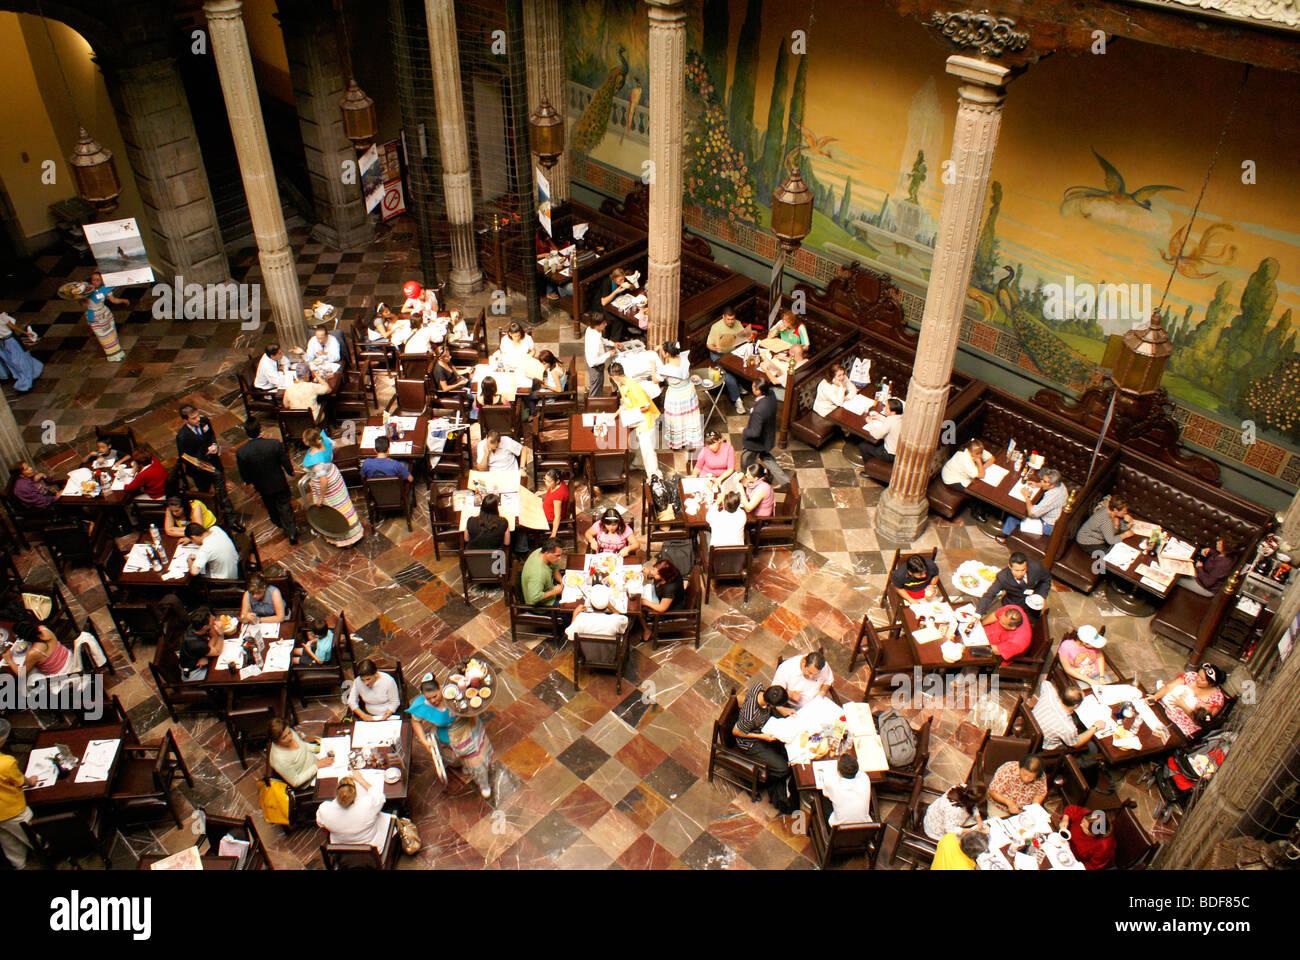 diners-in-sanborns-restaurant-house-of-tiles-or-casa-de-los-azulejos-BDF85C.jpg